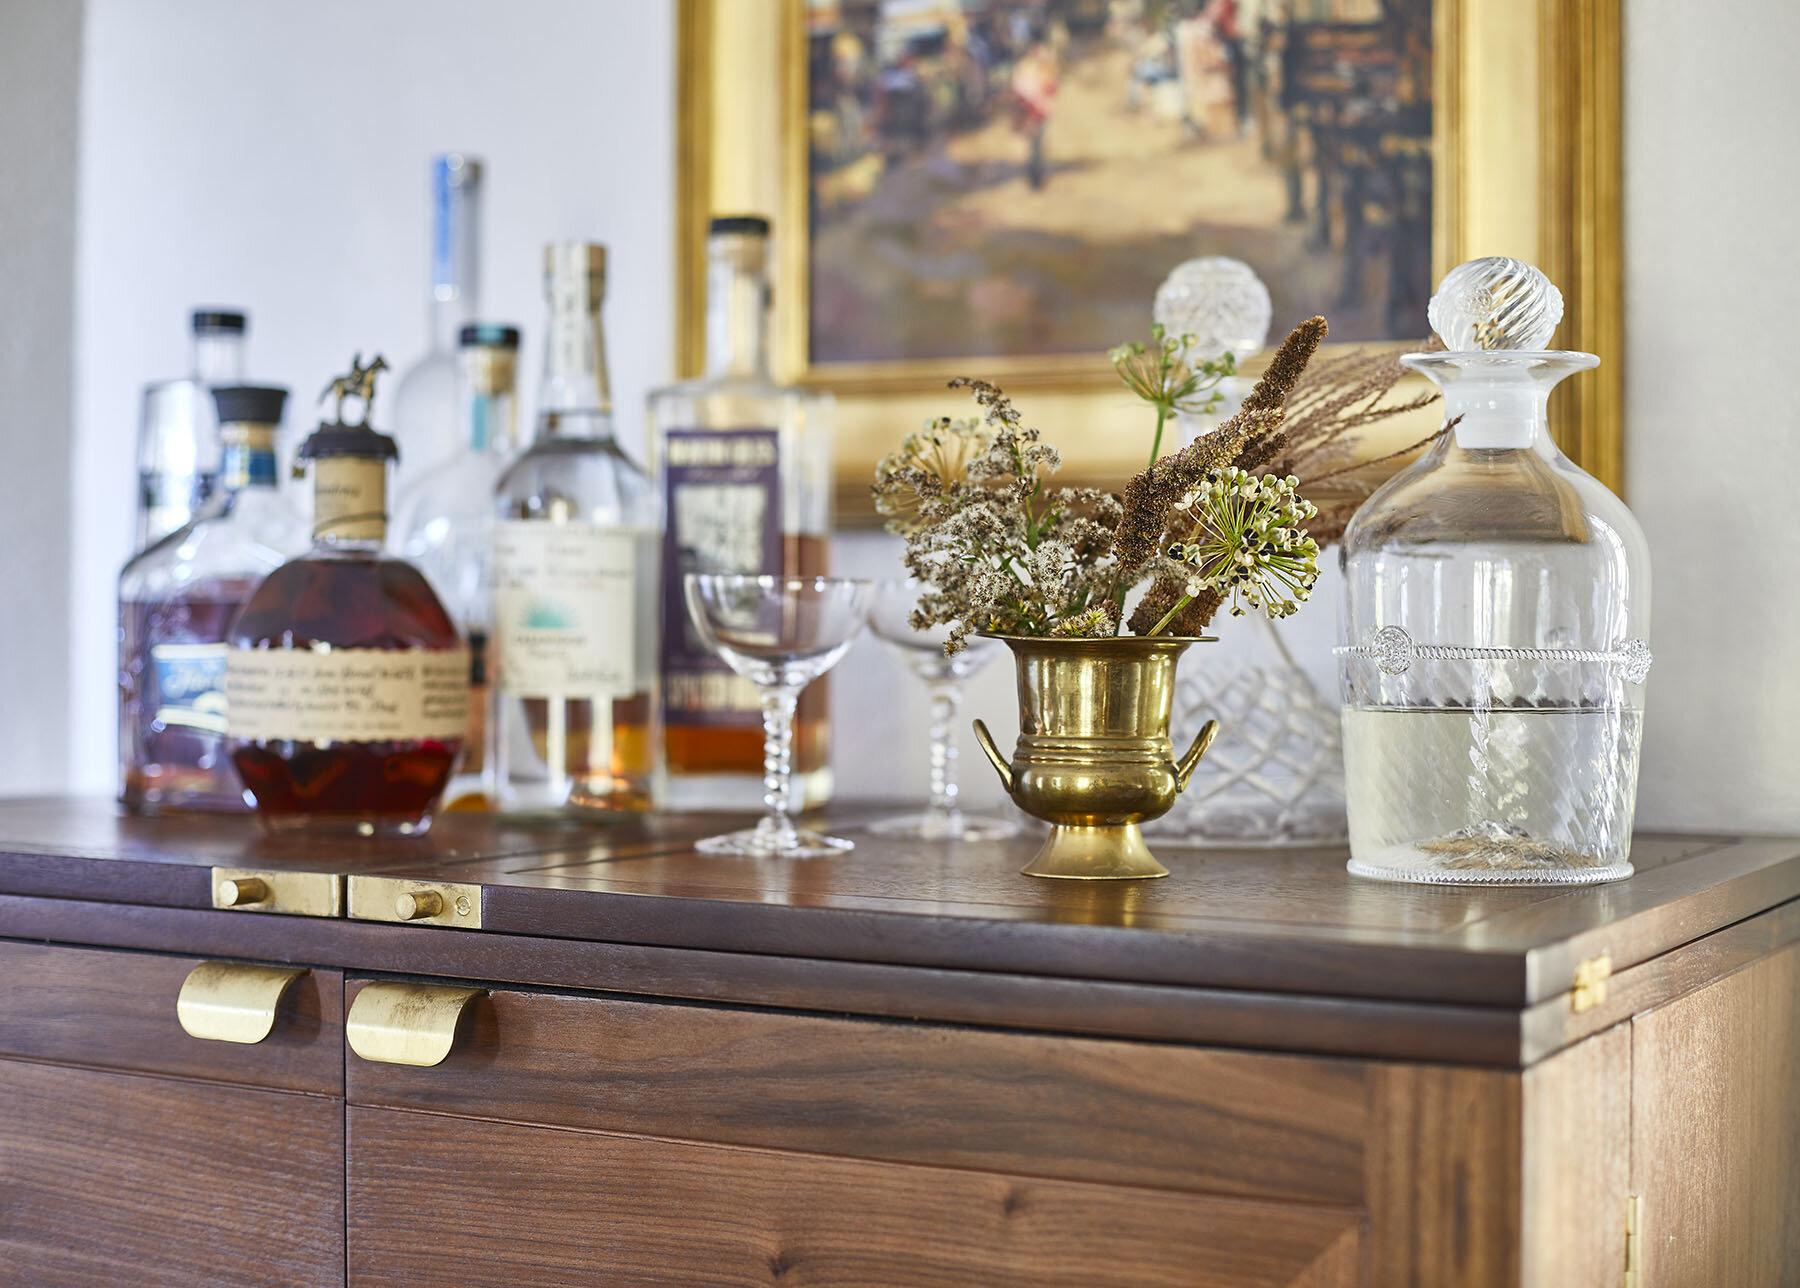 mackenzie-and-company-boston-westwood-interior-design-bar-cart-style